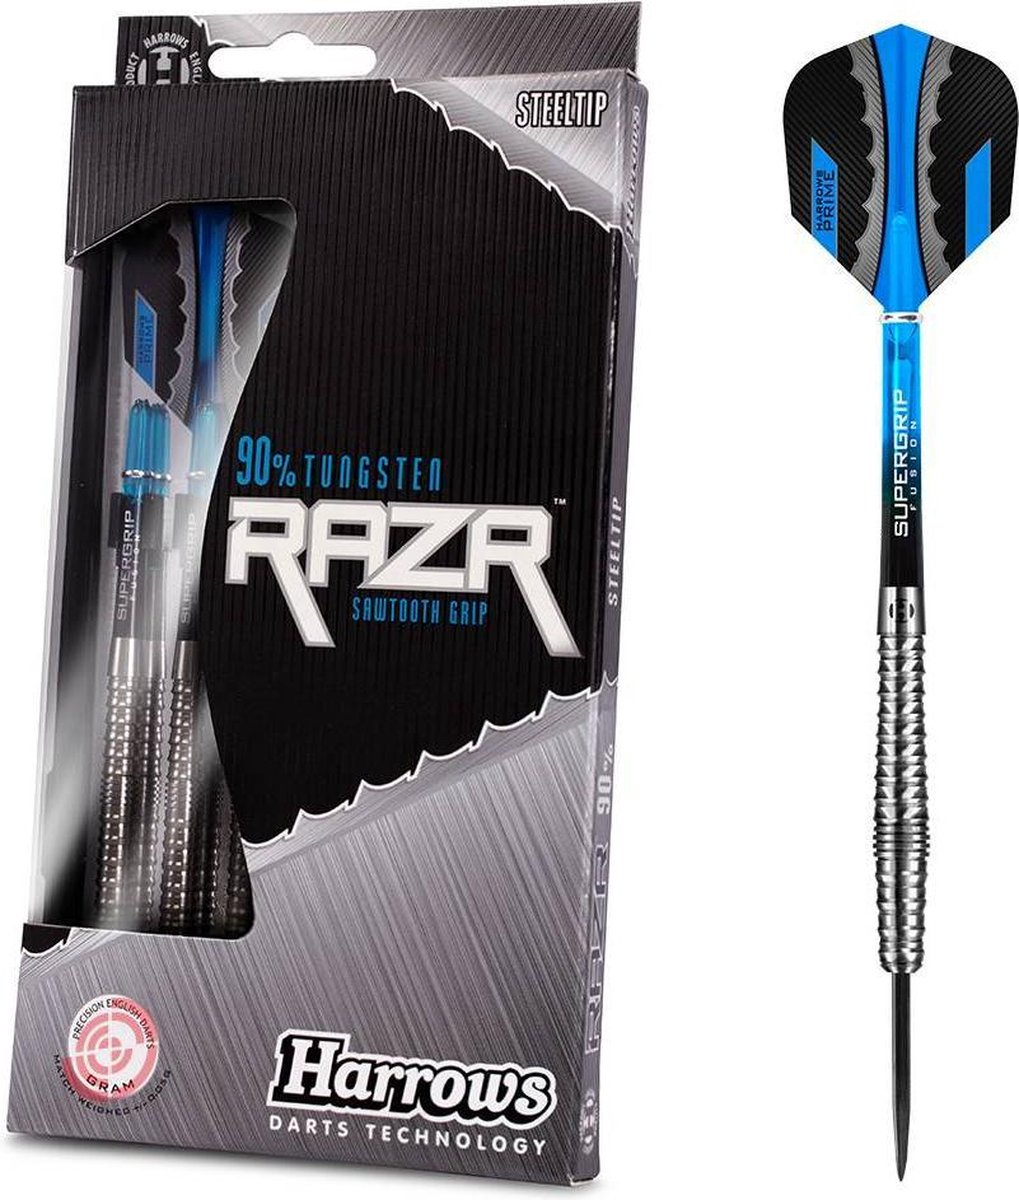 Harrows Razr Bulbous 90% - 26 Gram